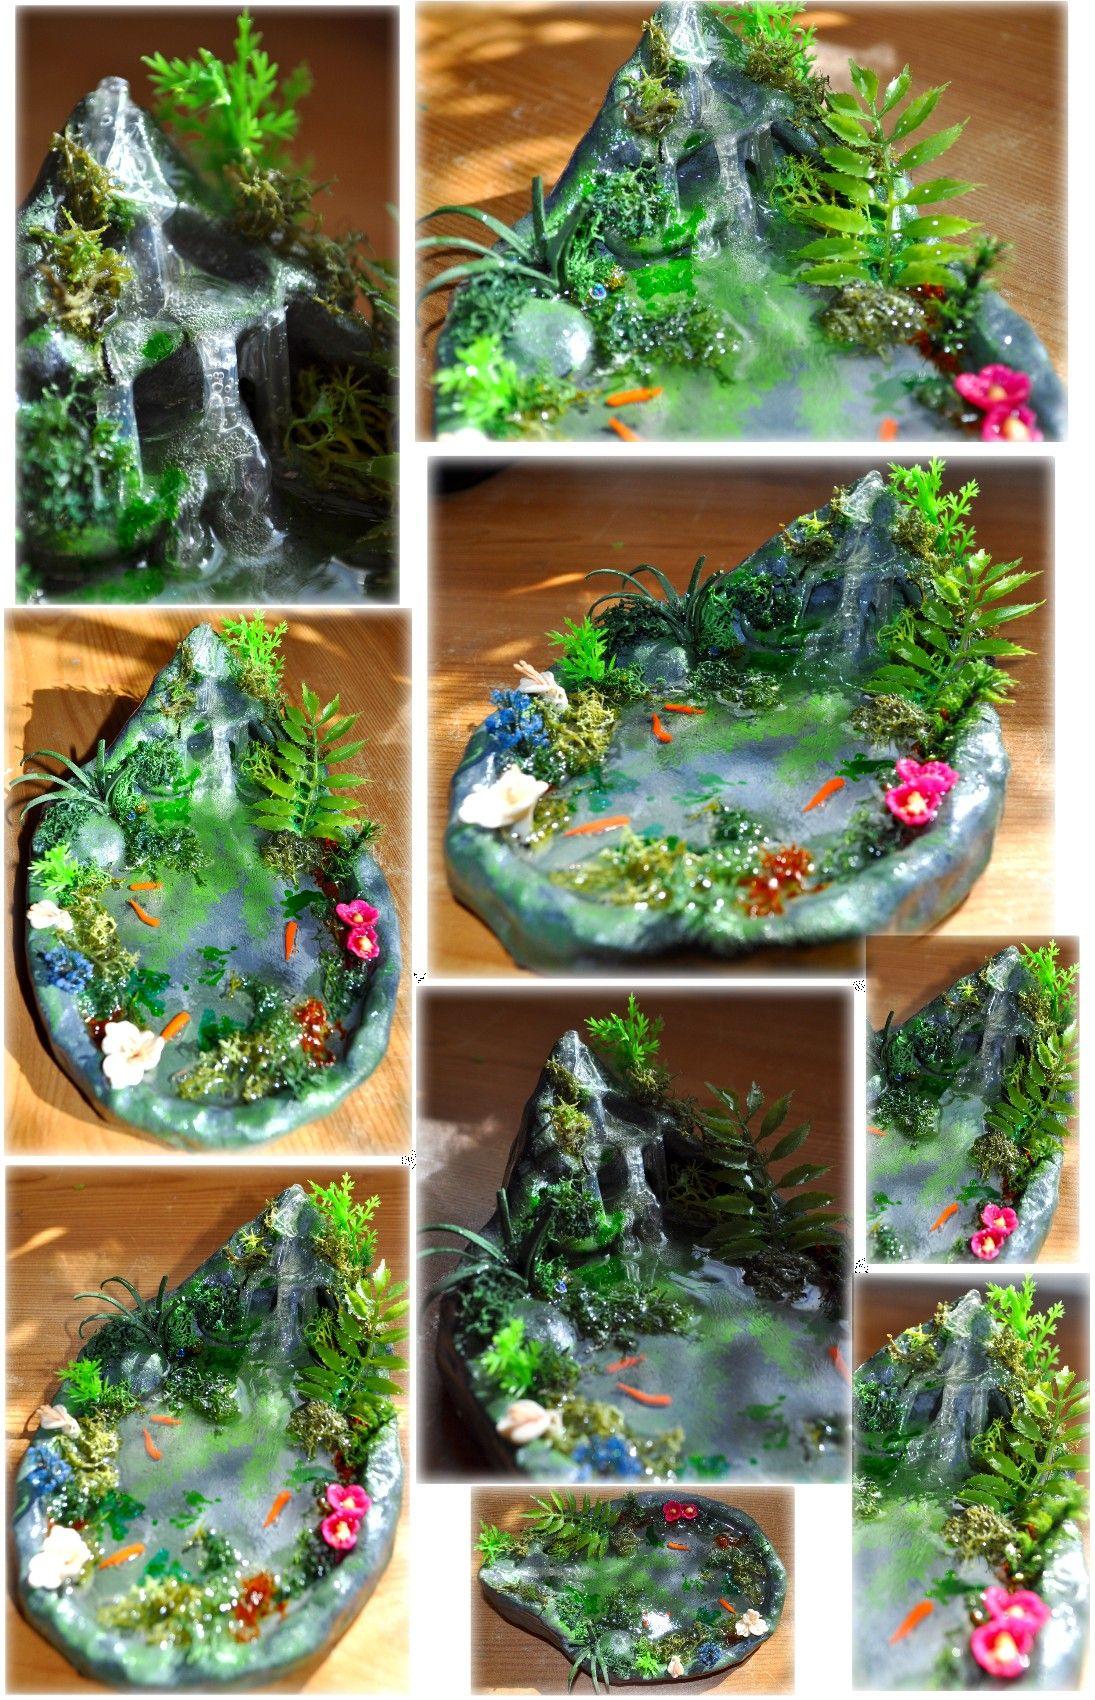 Glancing Waterfall Fairy Garden Waterfall Castle Ooak Faery Waterfall Pond By On Ooak Faery Waterfall Pond By On Fairy Garden Ideas